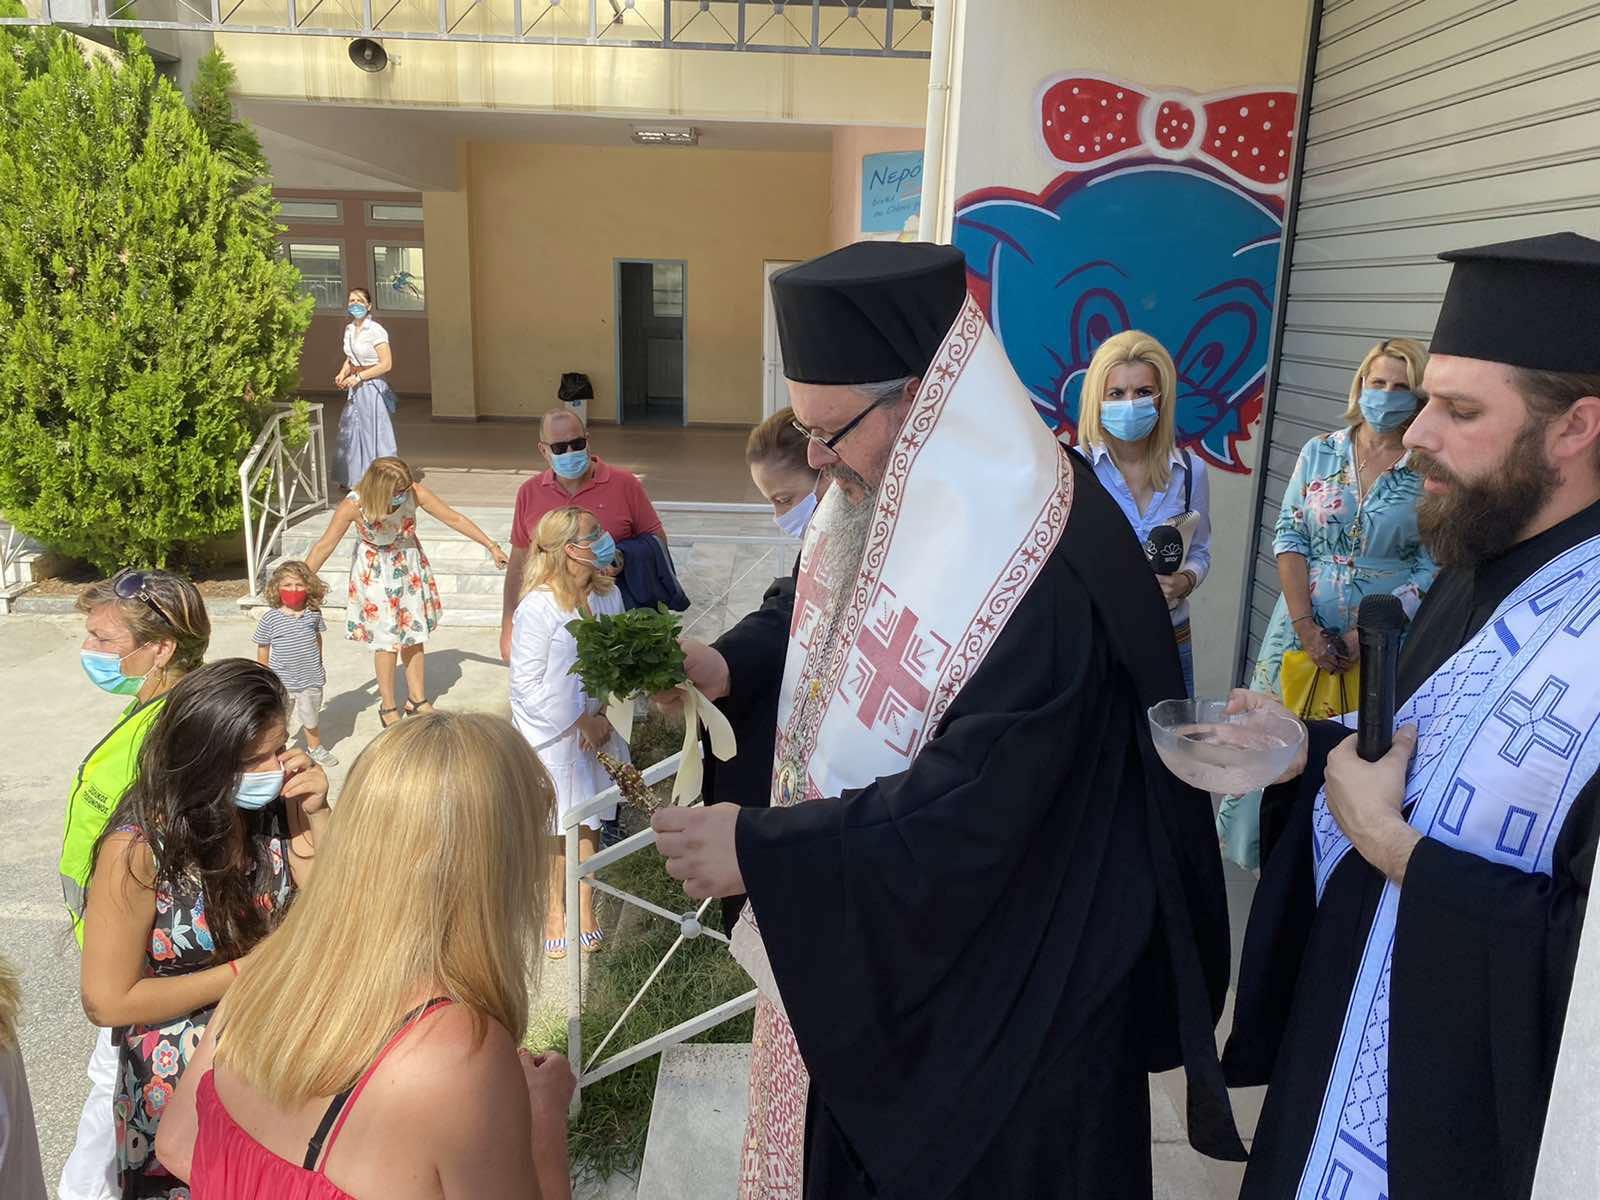 Agiasmoi 2020 4 - Αγιασμούς σε Σχολικές Μονάδες τέλεσε ο Σεβασμιώτατος